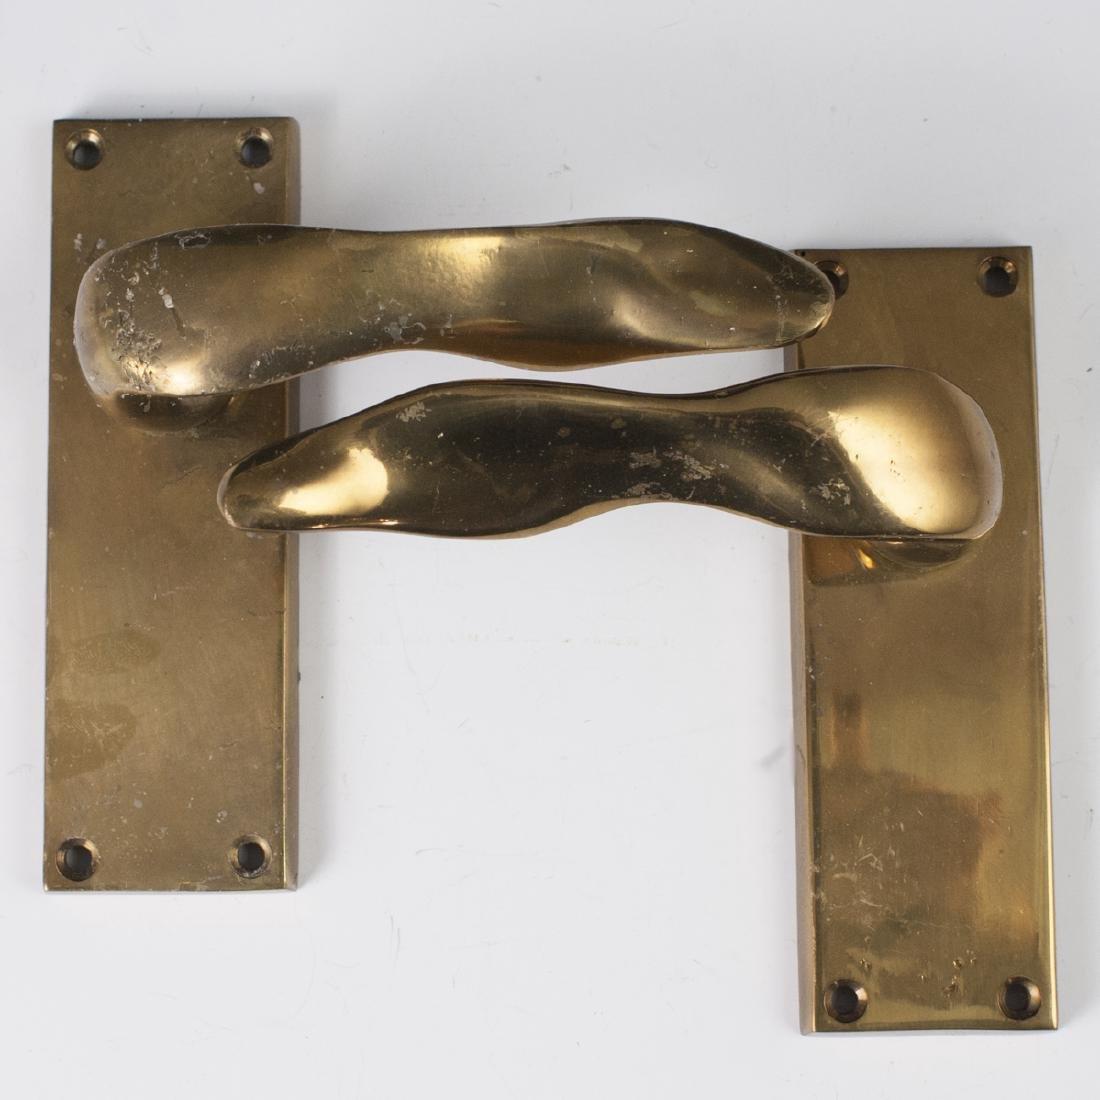 David Marshall Brass Door Knobs